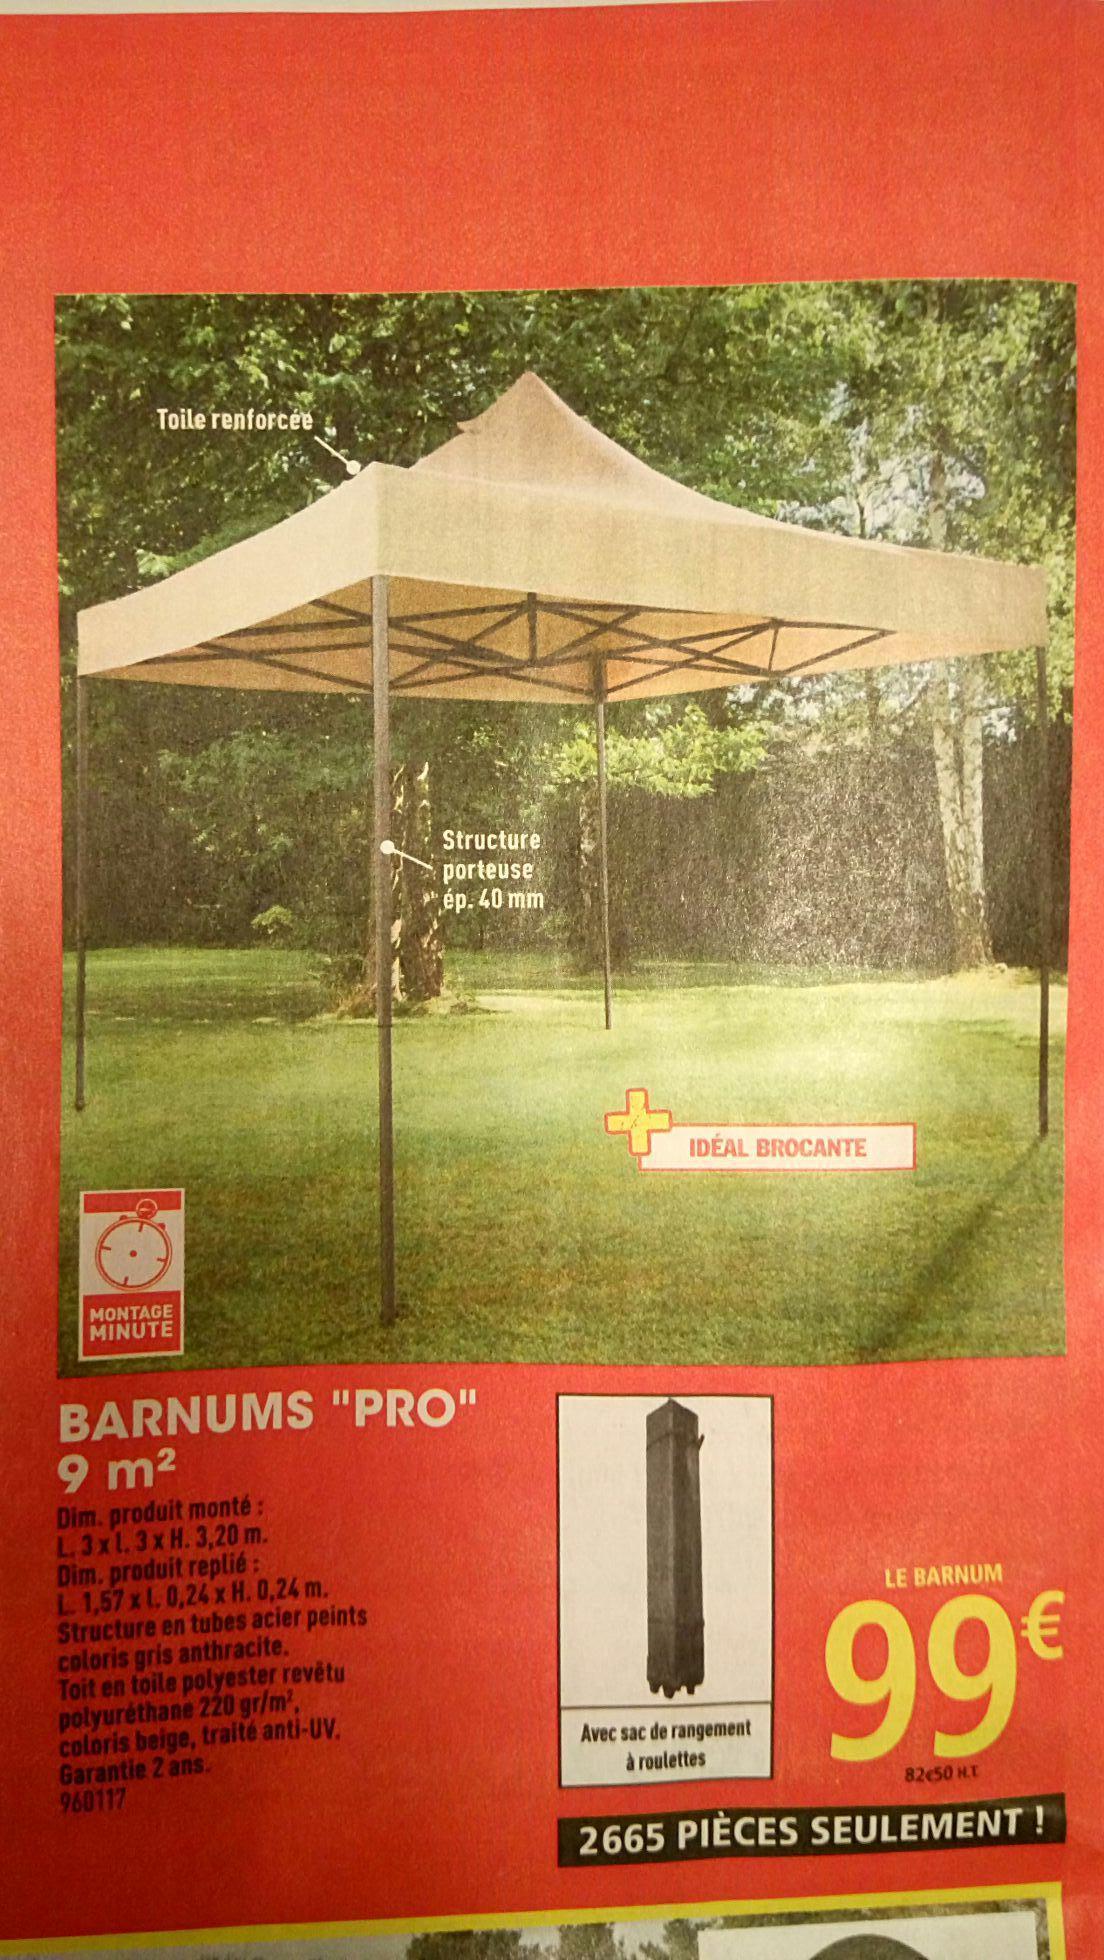 Tente Pliable Barnums Paddock Pro 9 m²